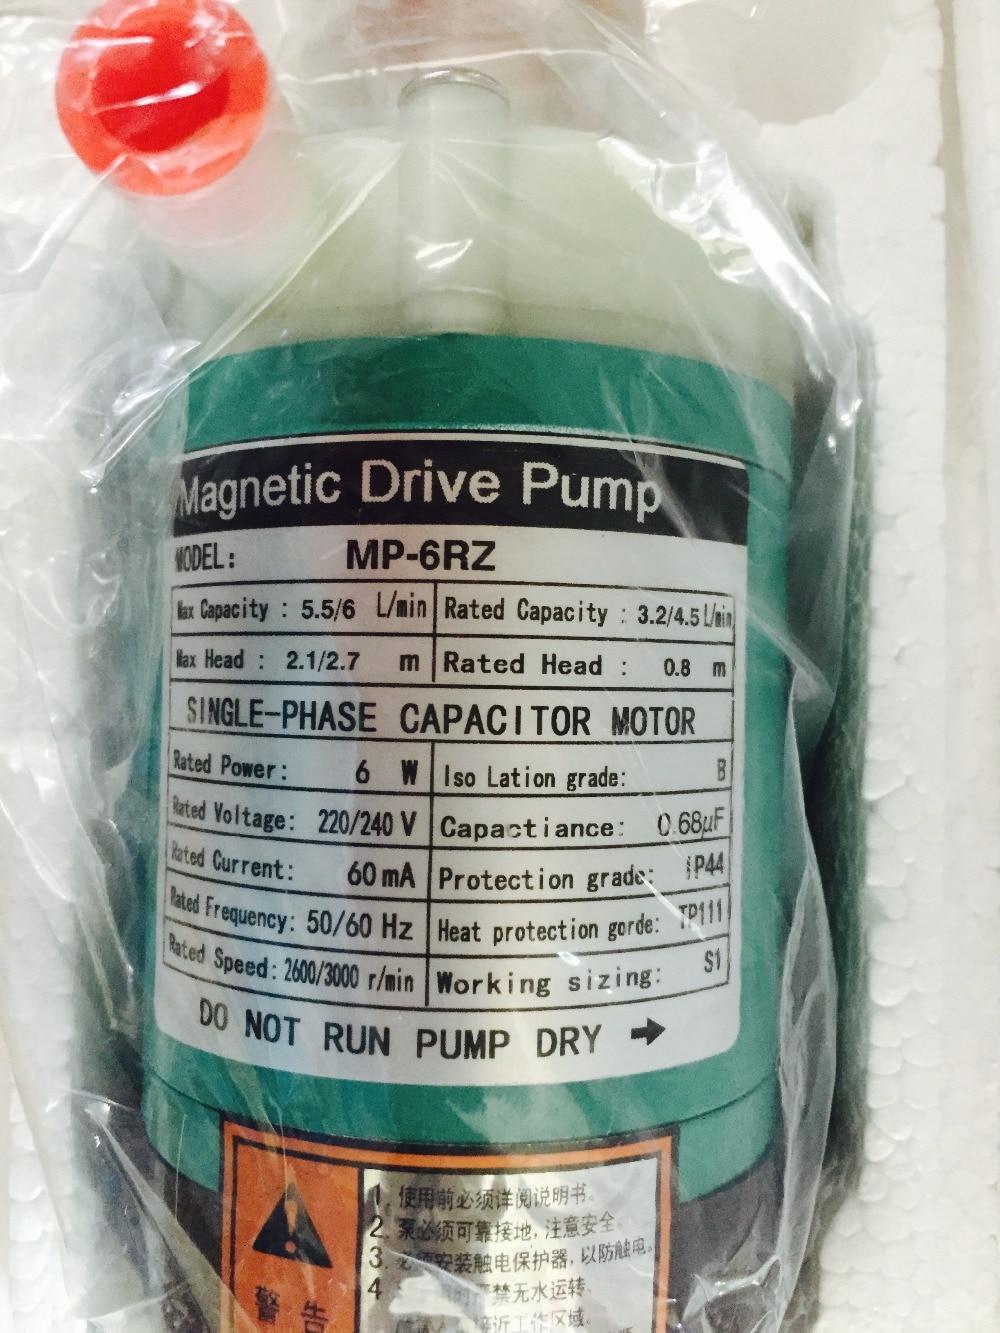 MP-6RZ 220V AC Power Plastic Acid Resistance 220V Magnetic Drive Water PumpMP-6RZ 220V AC Power Plastic Acid Resistance 220V Magnetic Drive Water Pump